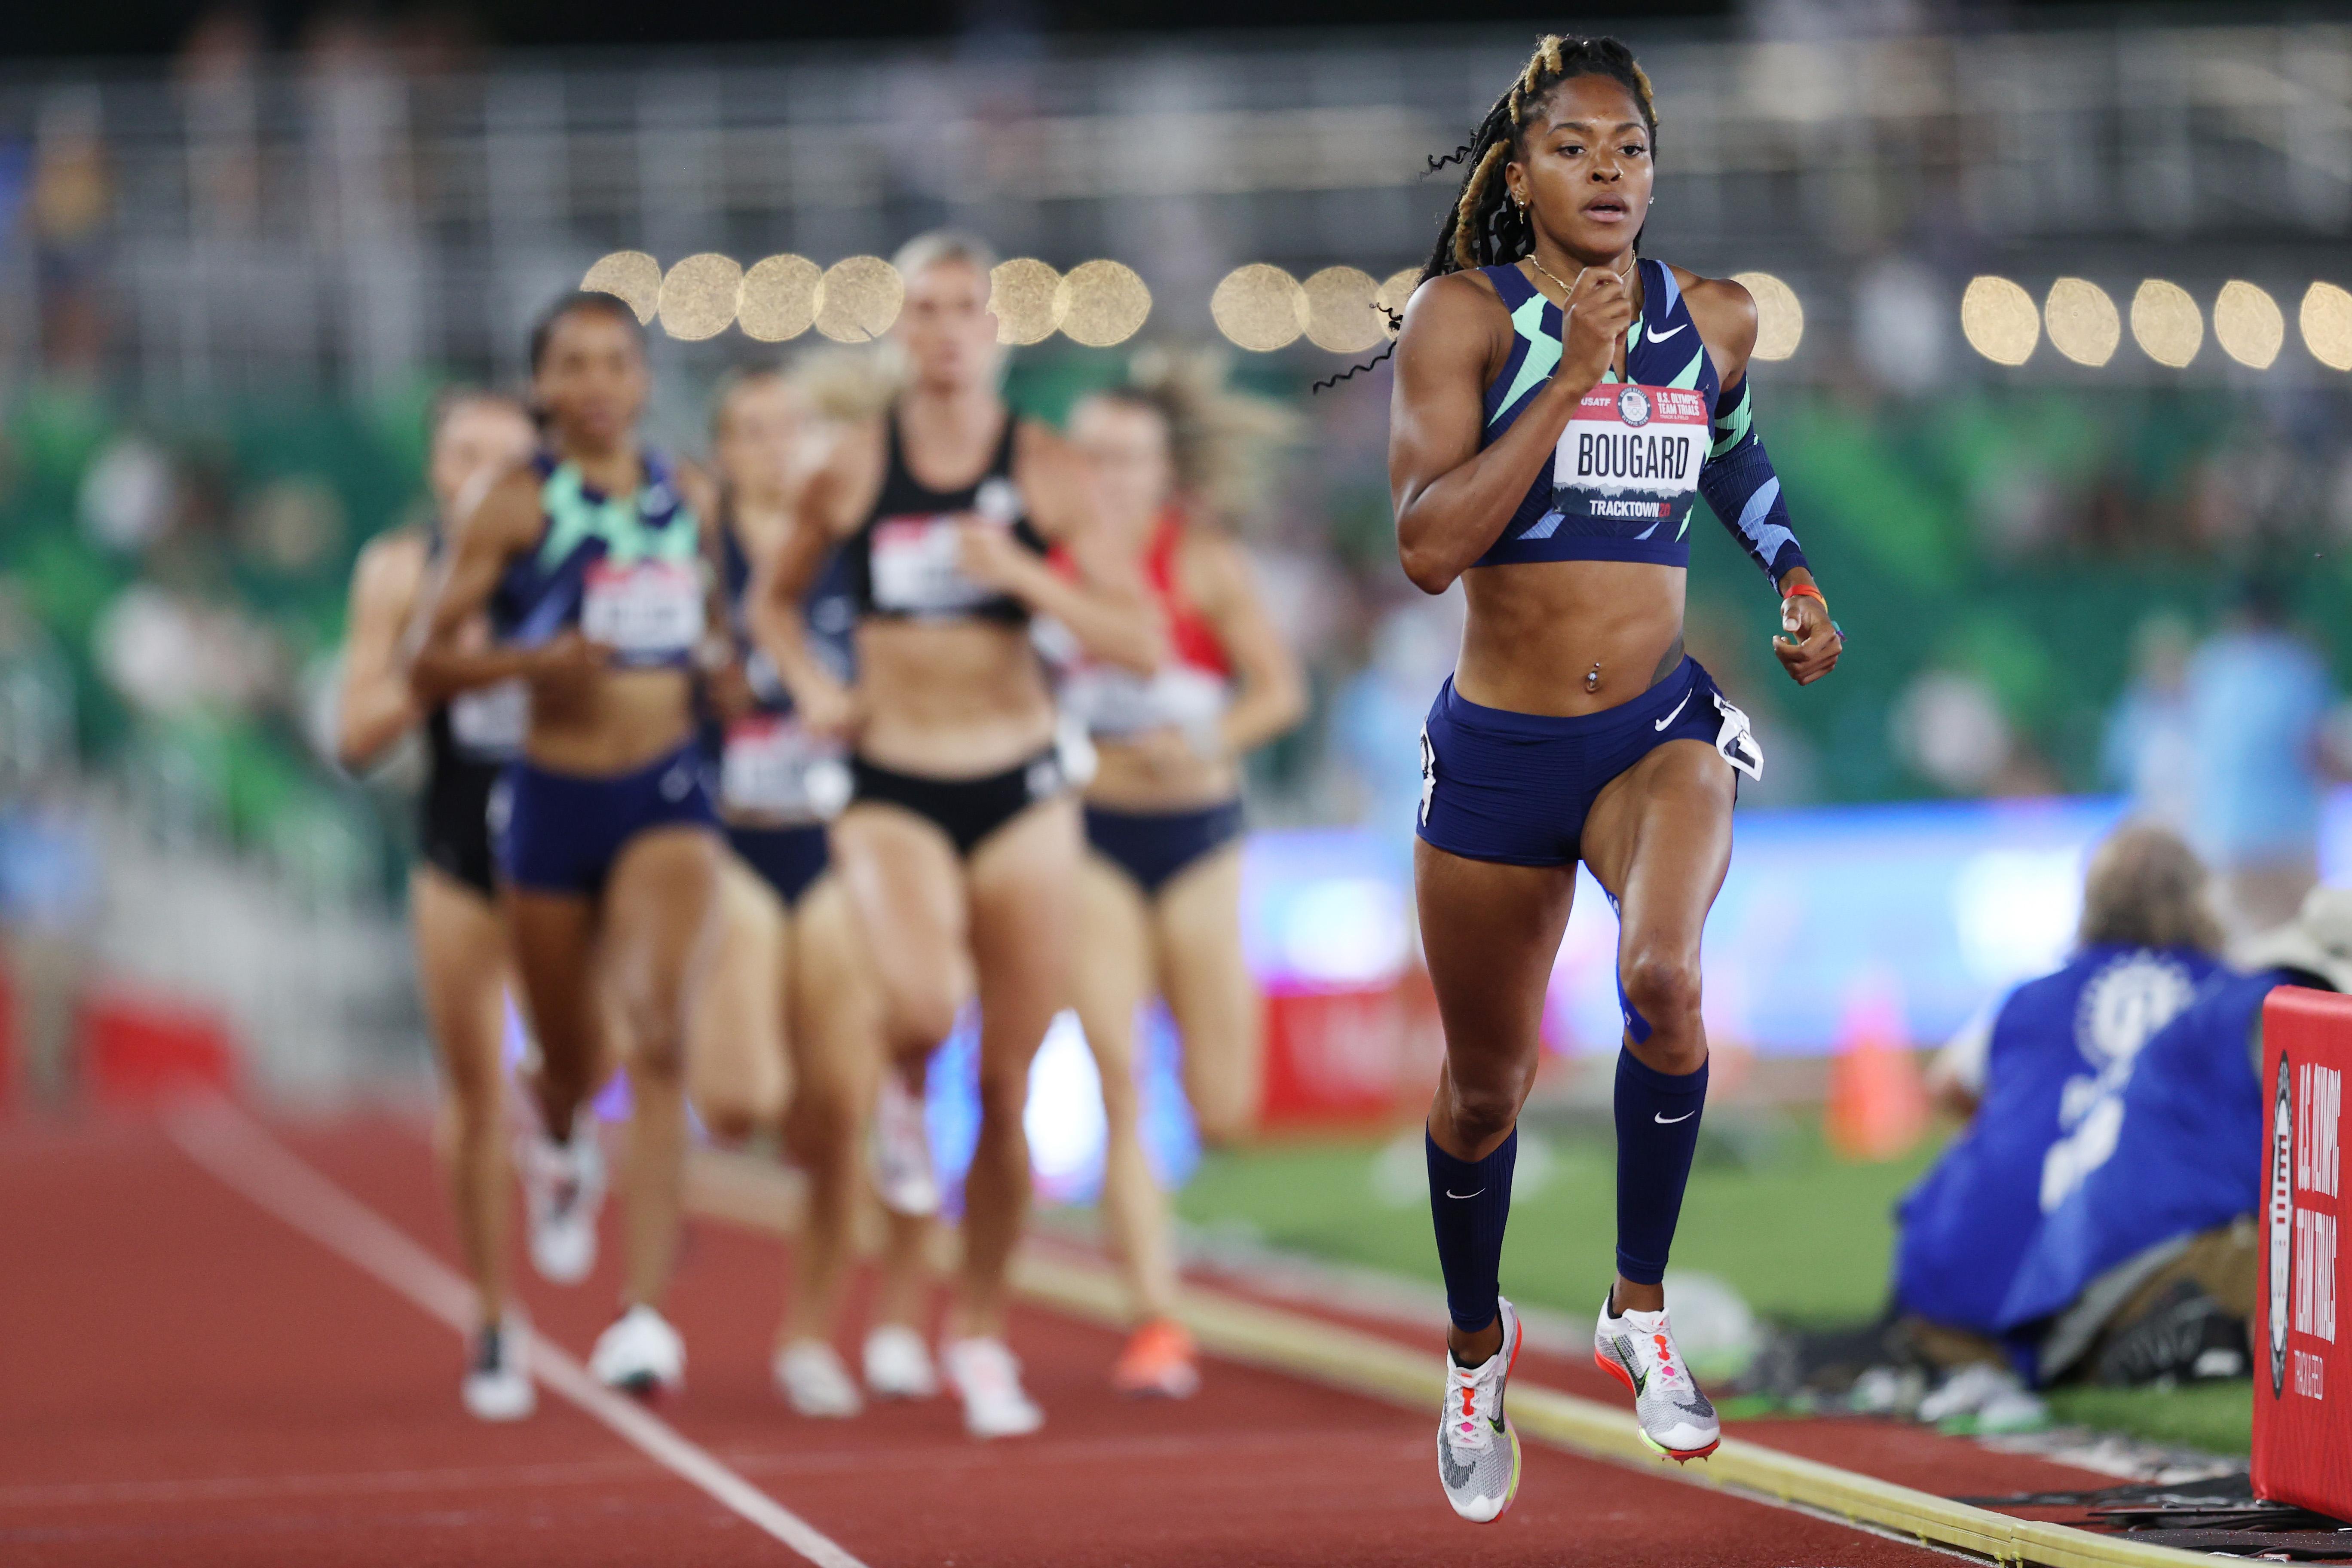 2020 U.S. Olympic Track & Field Team Trials - Day 10